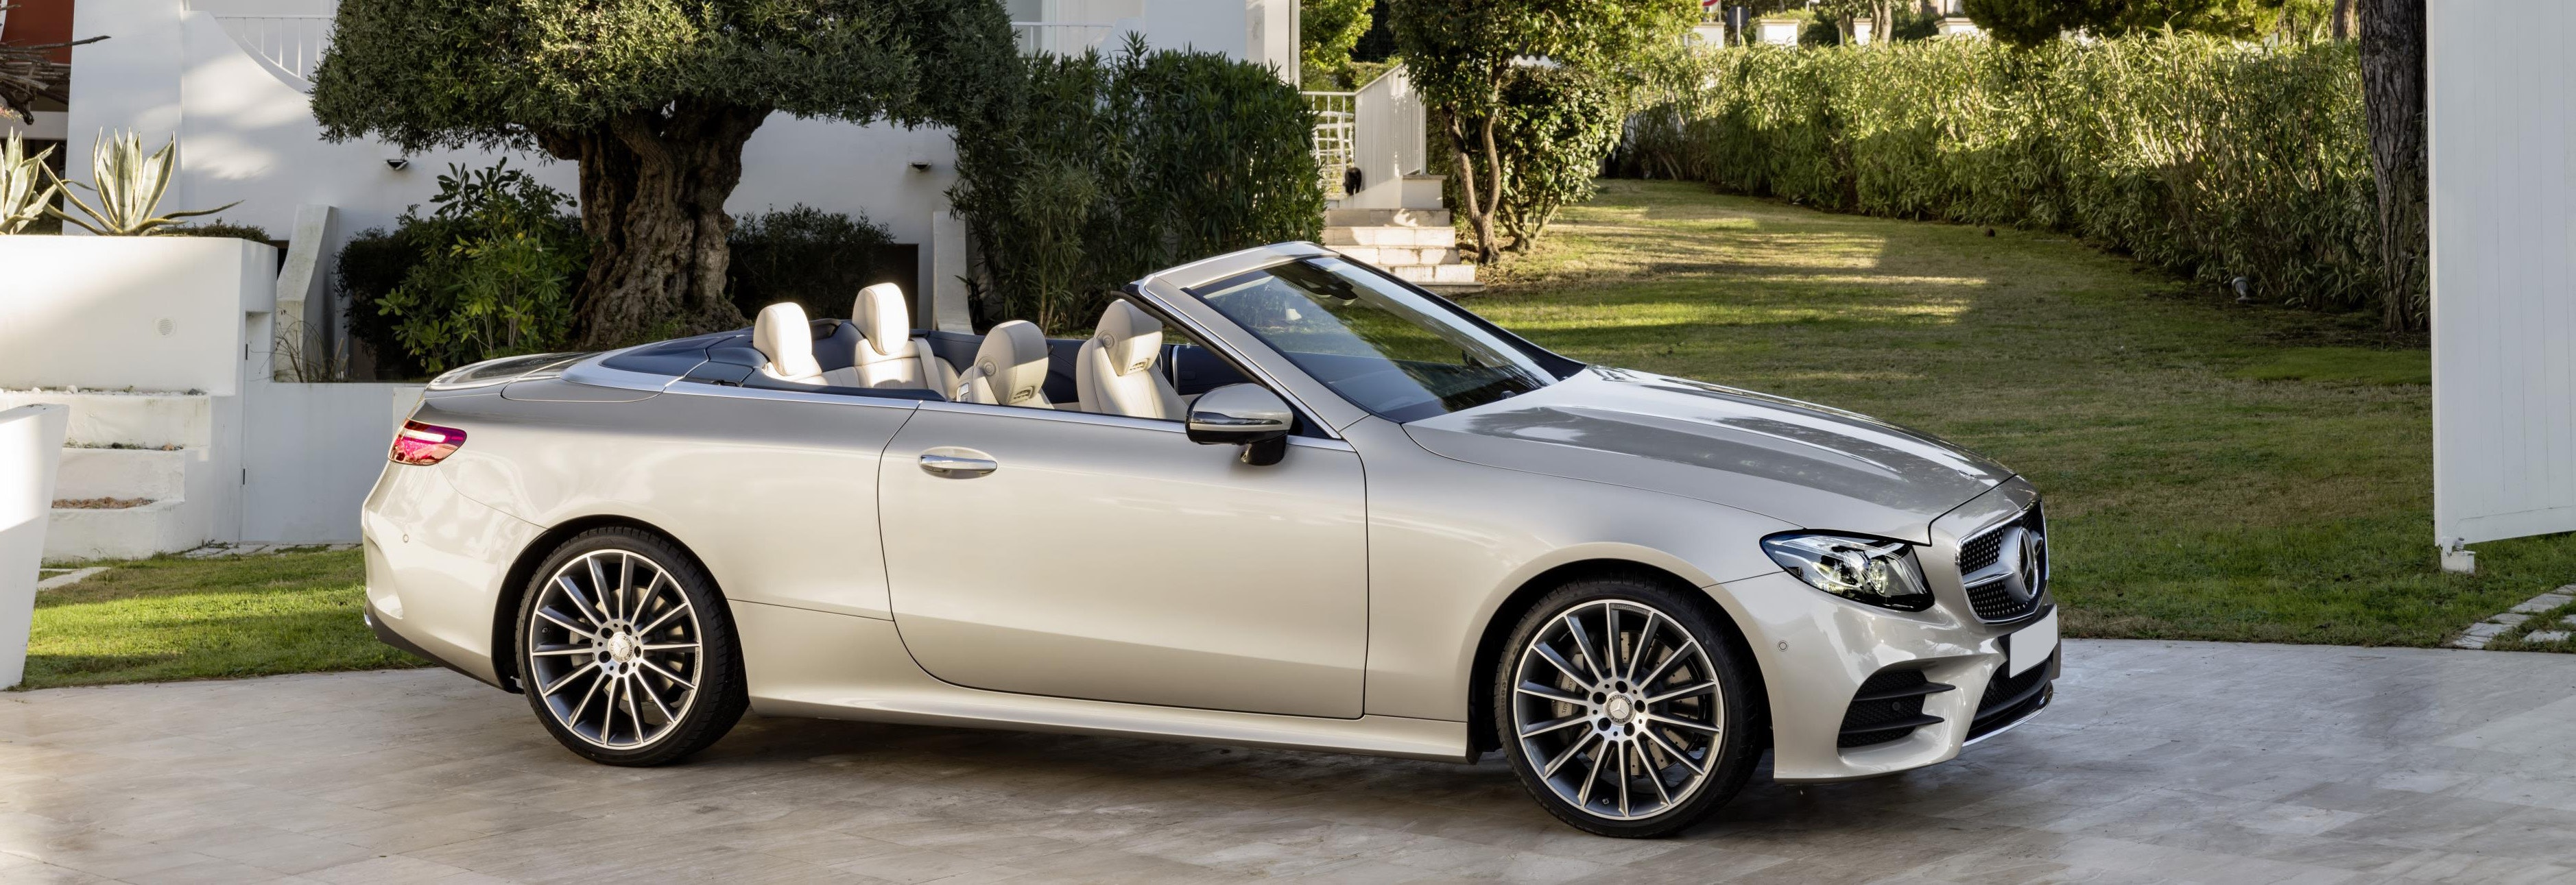 Gentil Mercedes E Class Cabriolet